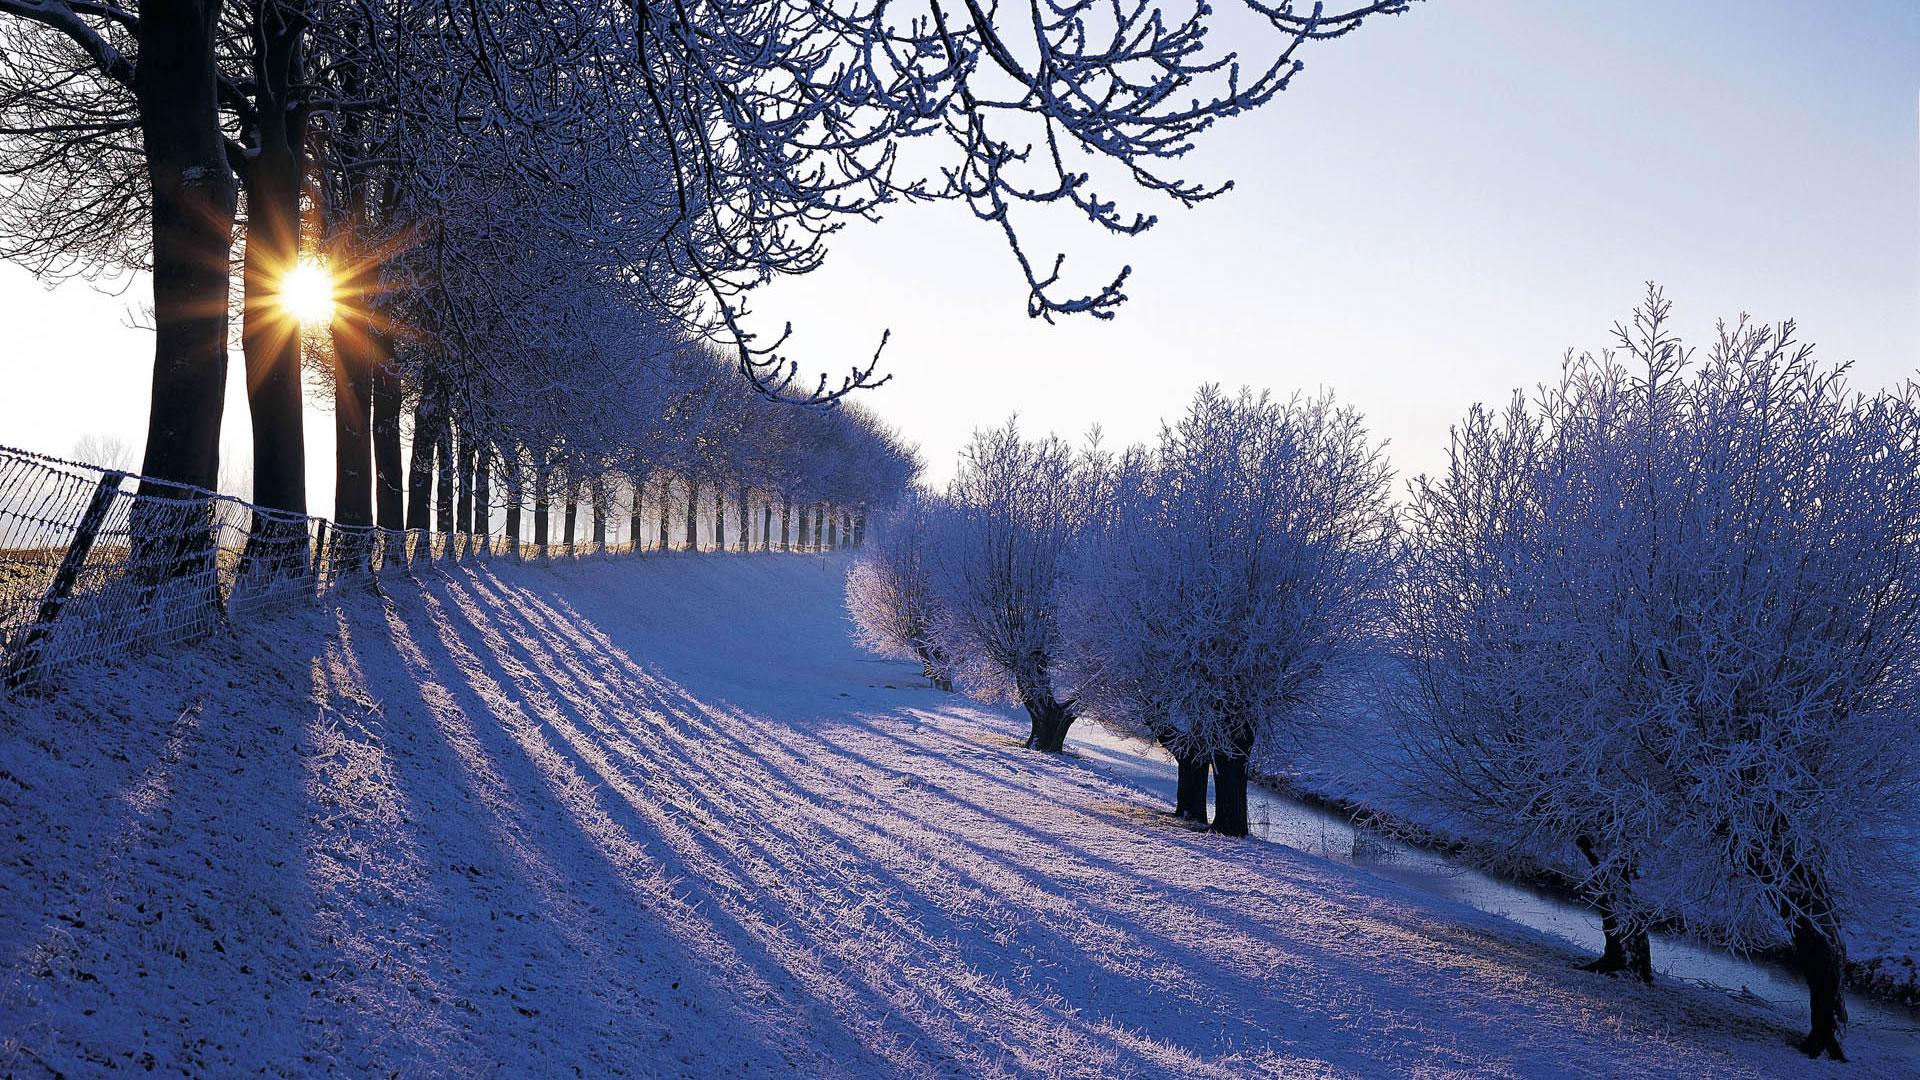 winter wallpaper 17512